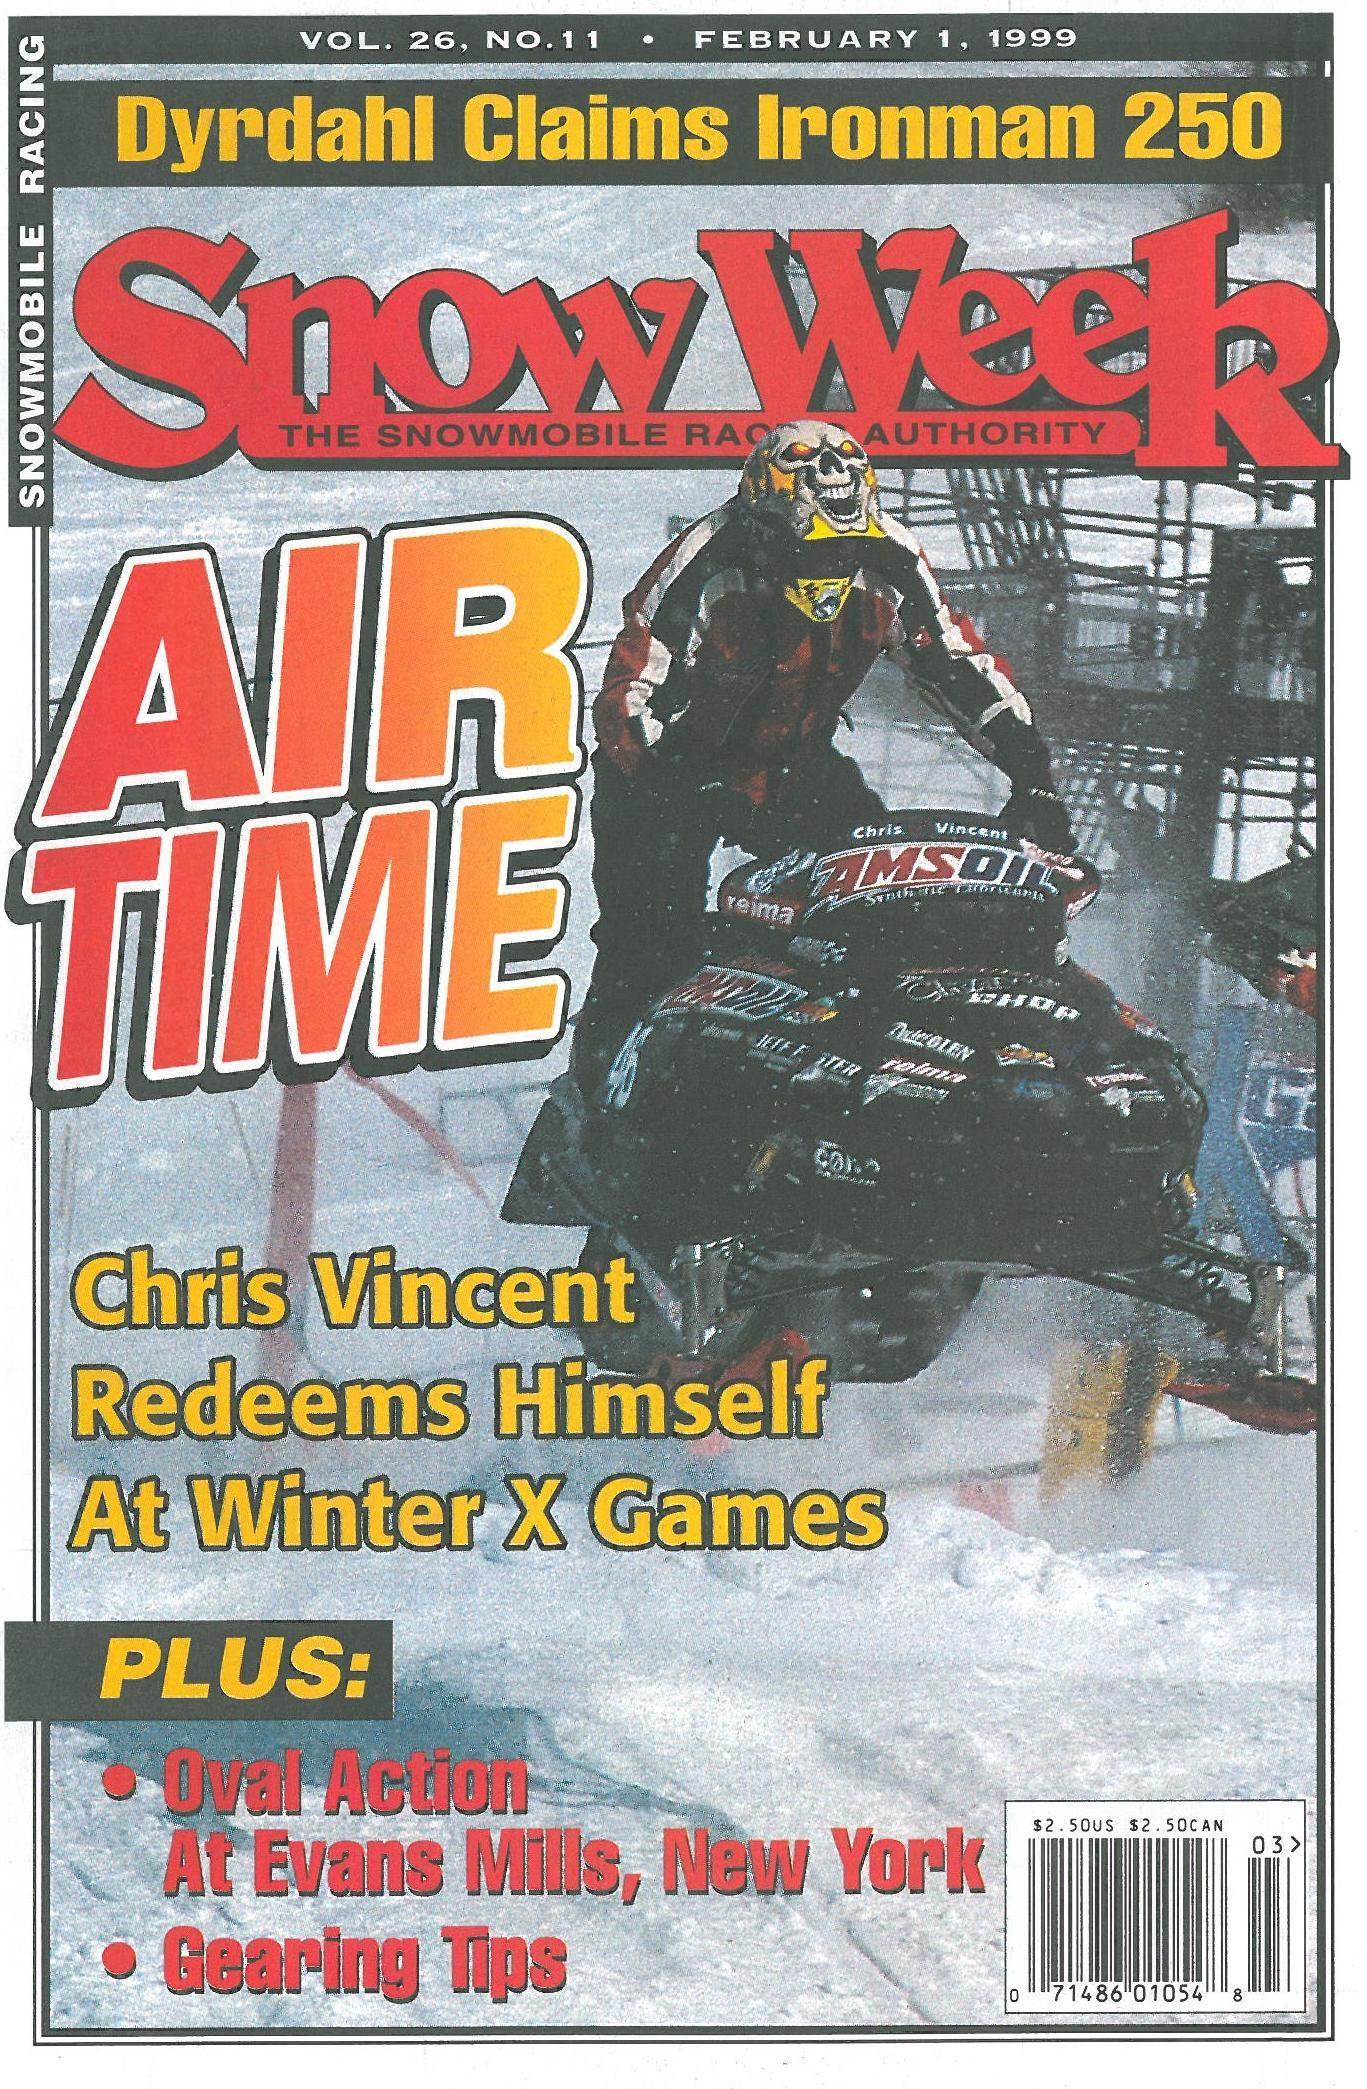 First Amsoil Sponsored Snocross Racer Chris Vincent In 1999